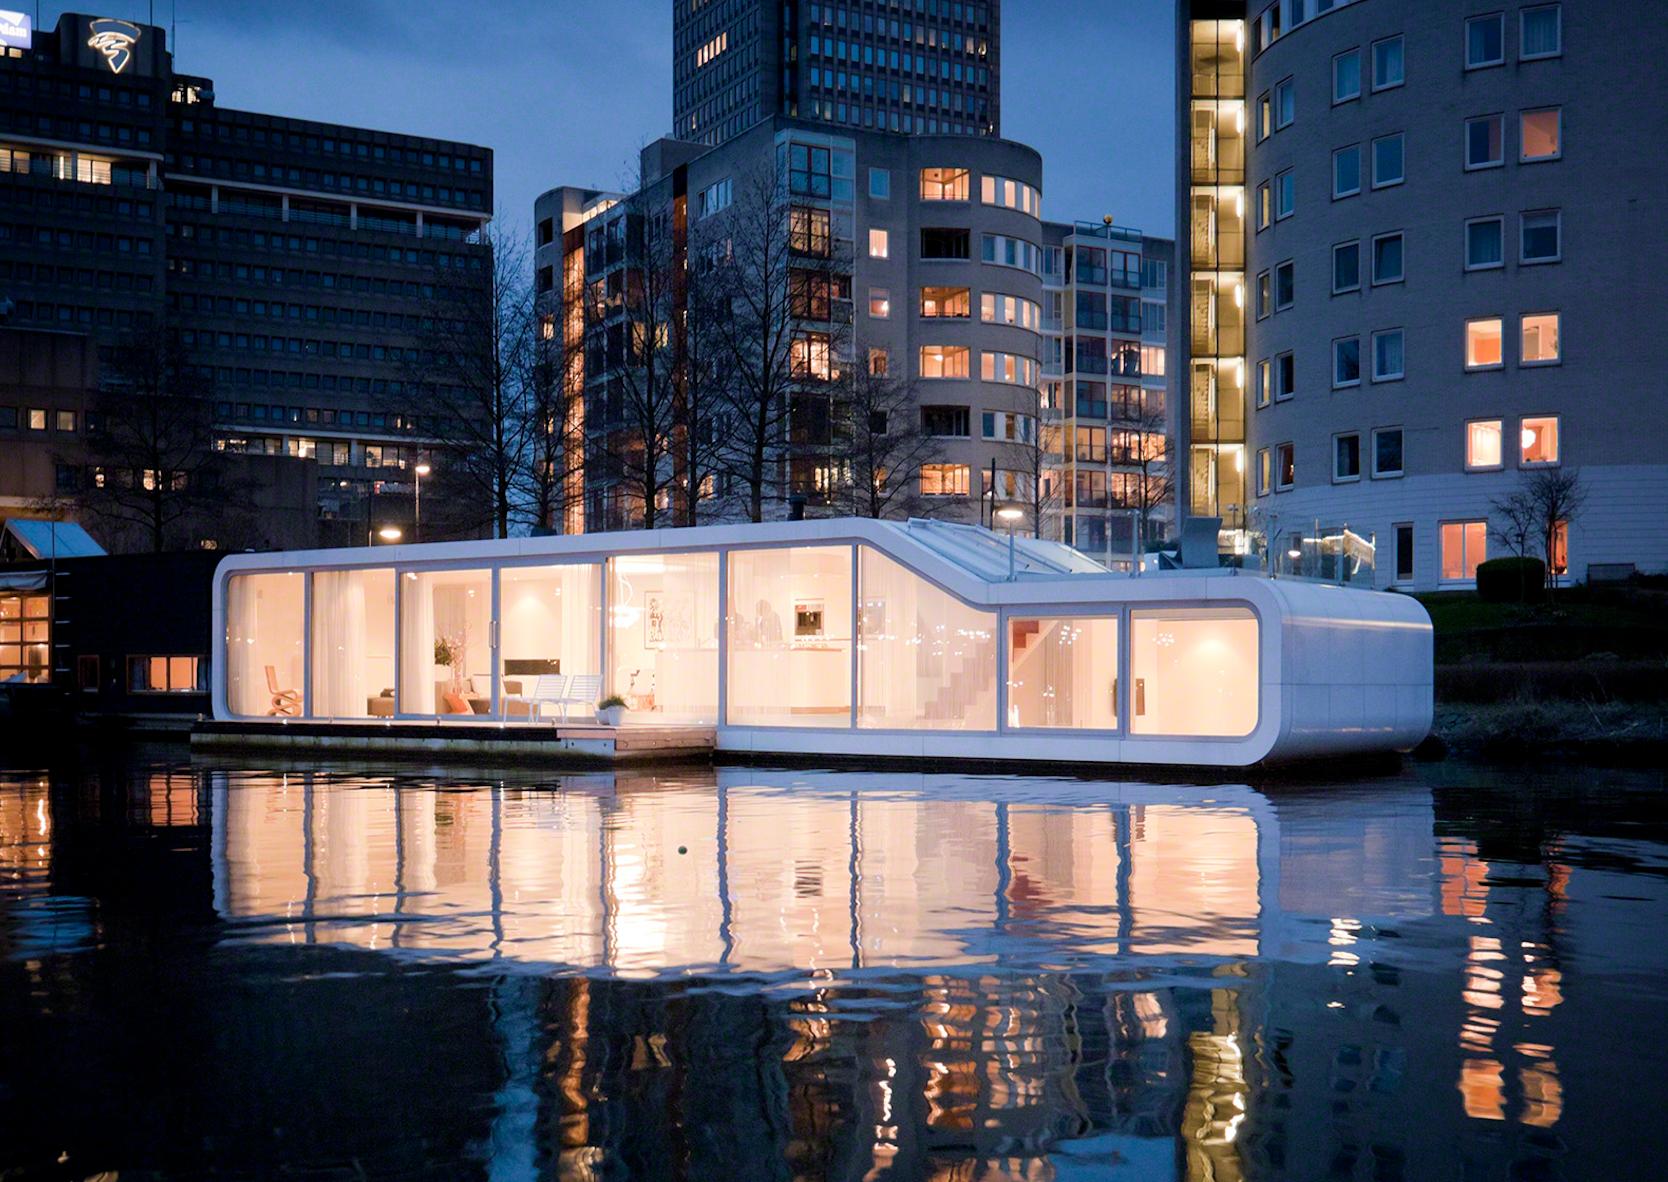 Watervilla de Omval, Amsterdam, the Netherlands. Photo: Iwan Baan